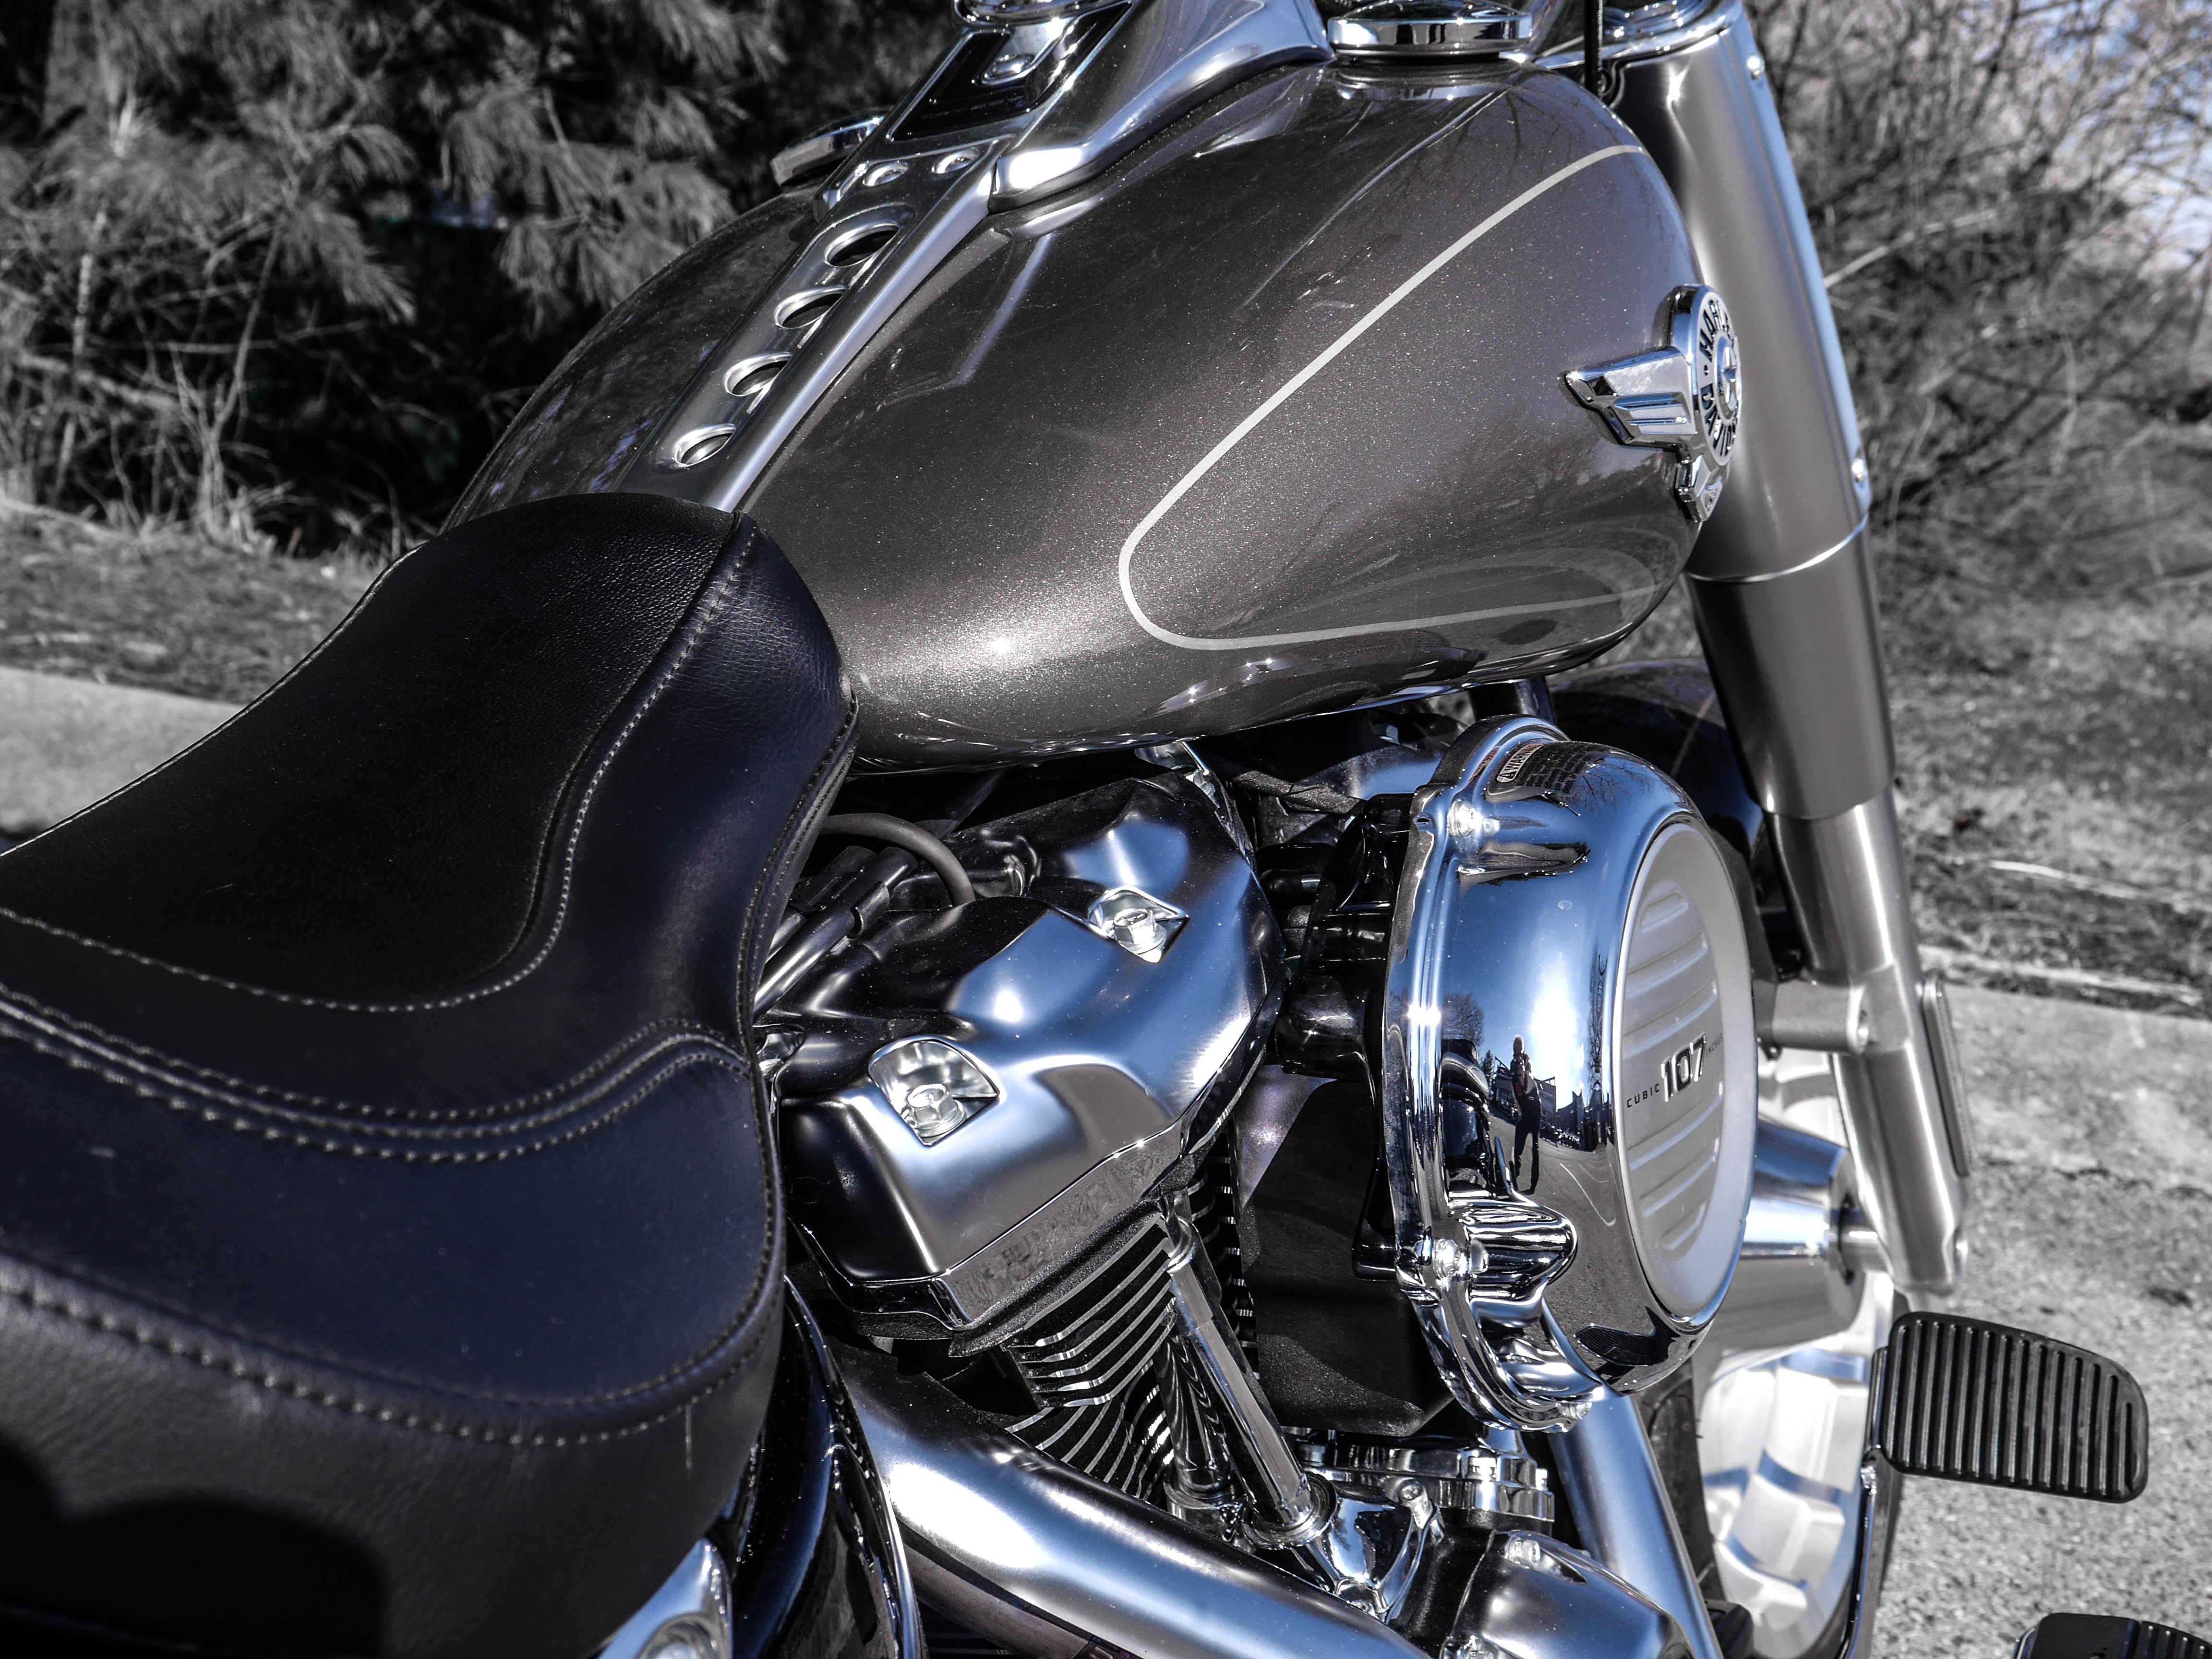 Pre-Owned 2018 Harley-Davidson Fat Boy